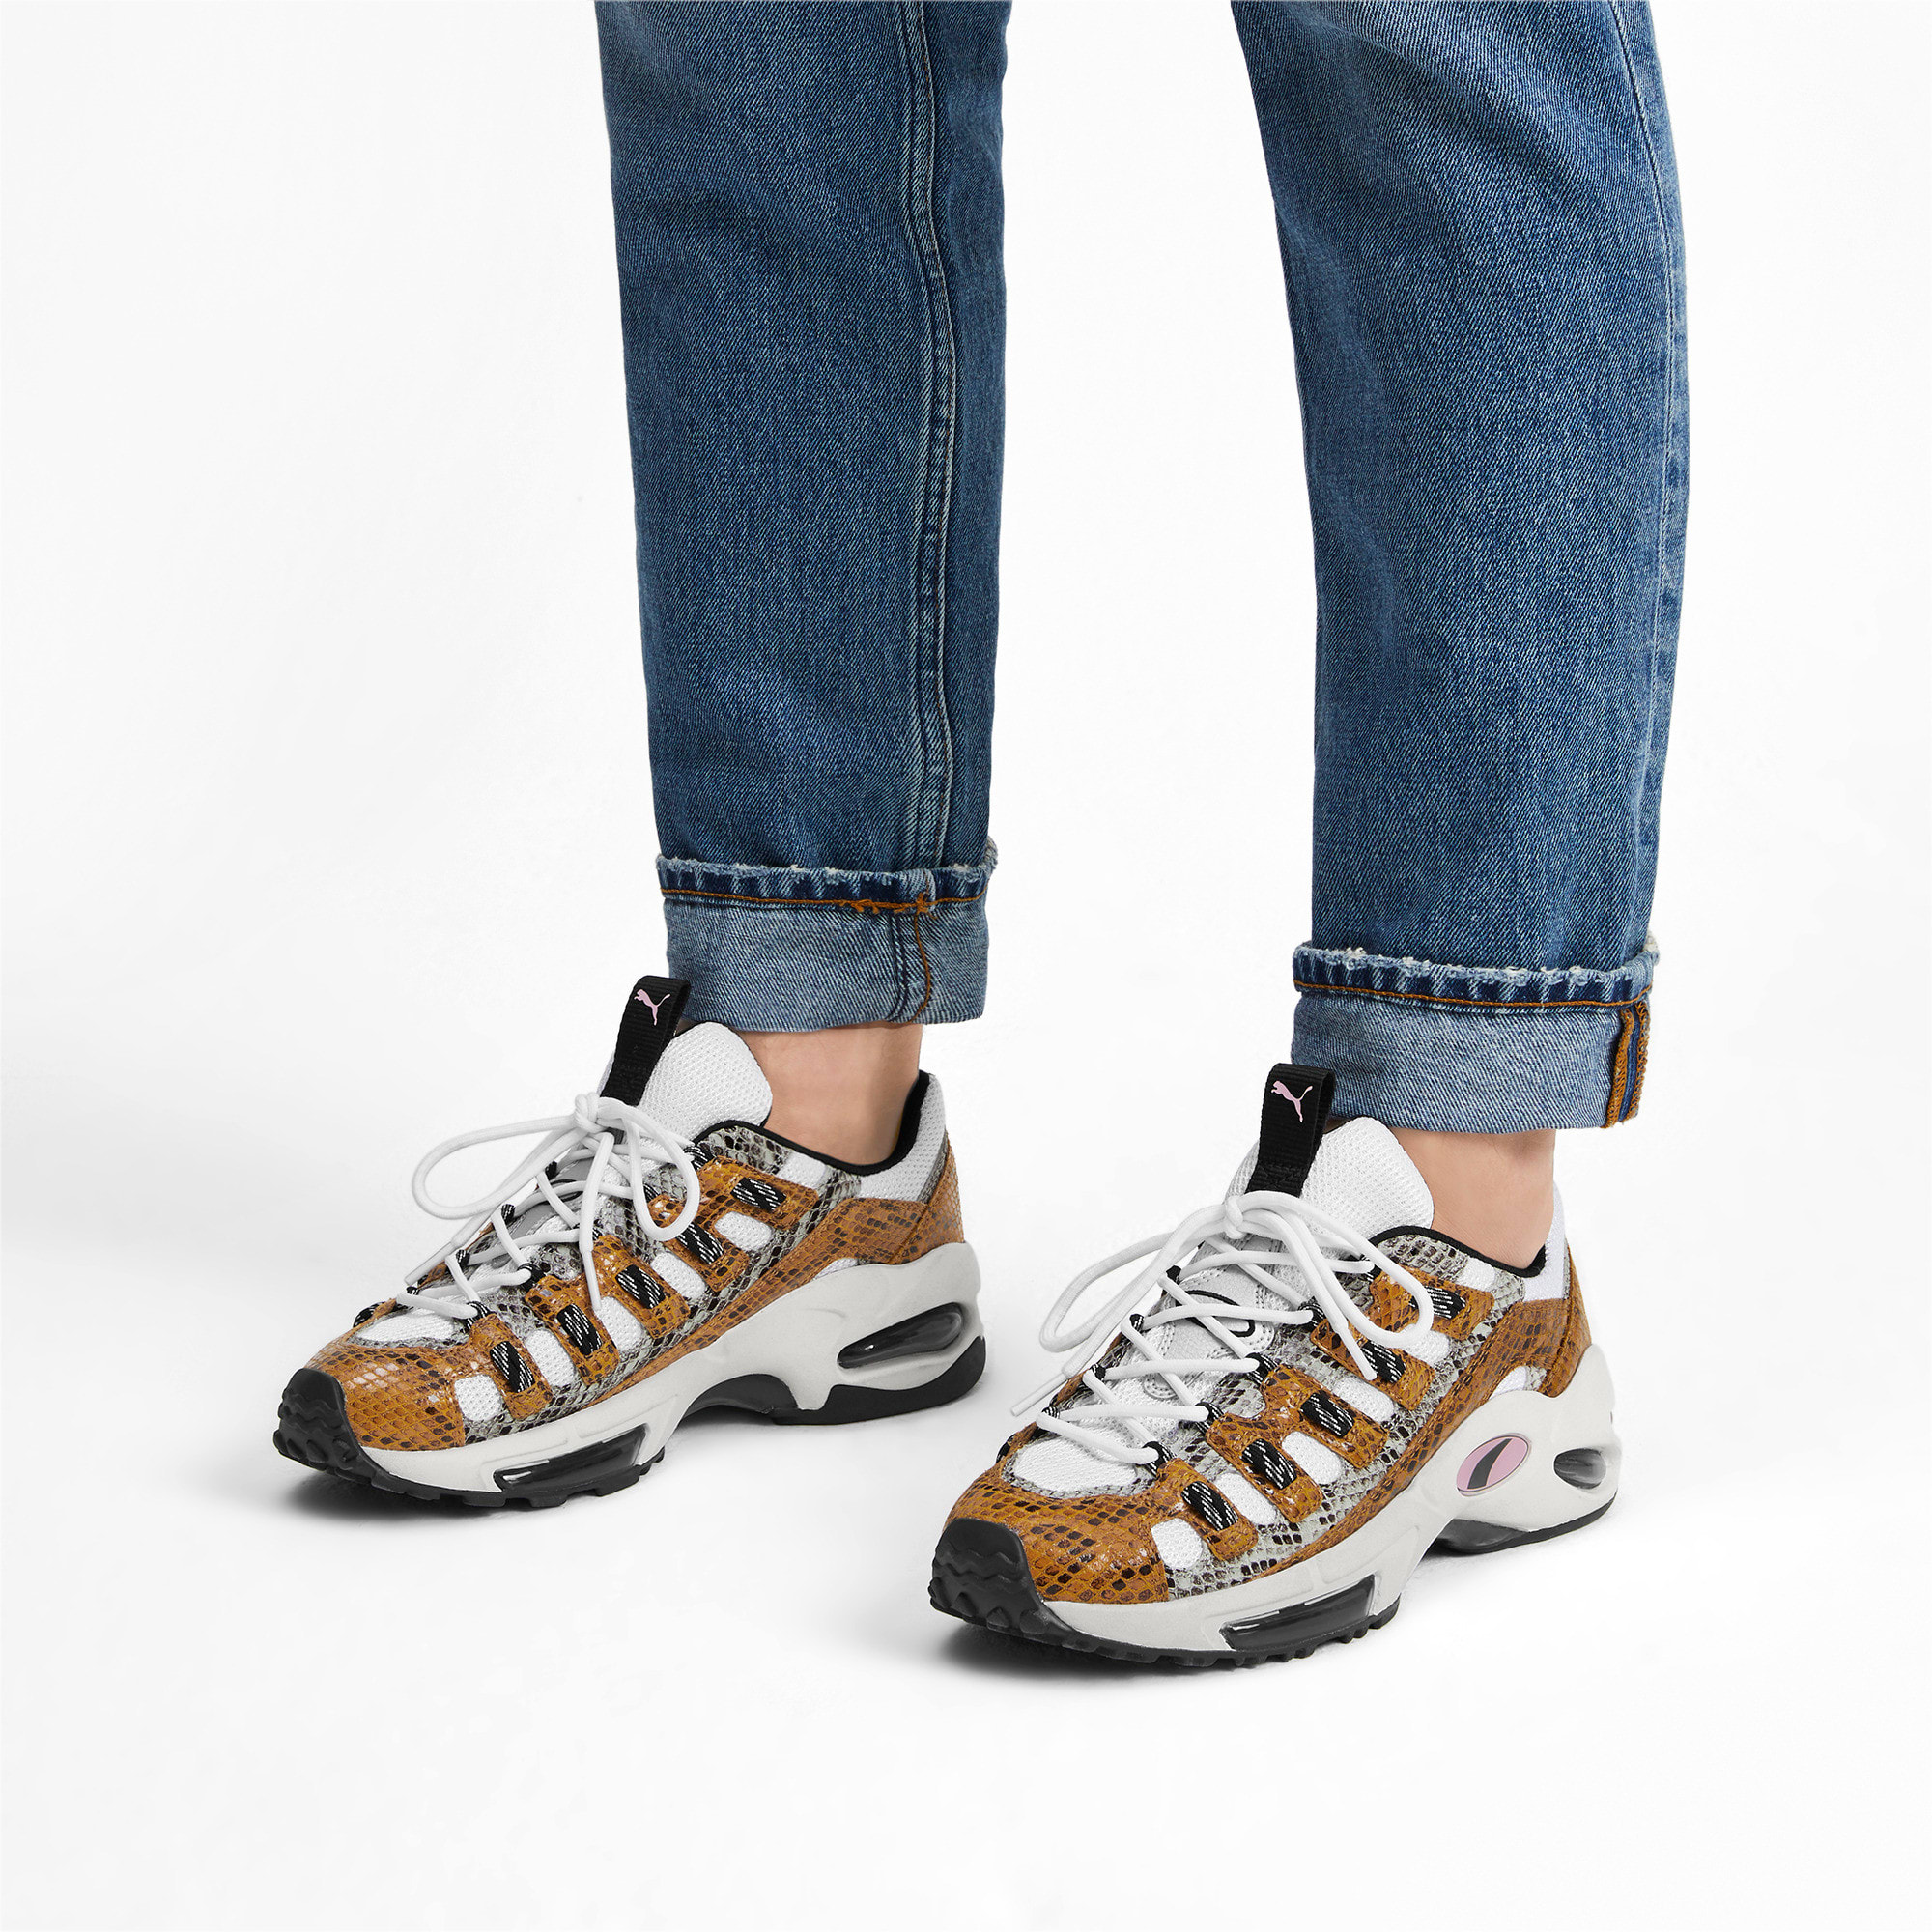 Thumbnail 2 of CELL Endura Animal Kingdom Sneakers, Puma White-Golden Orange, medium